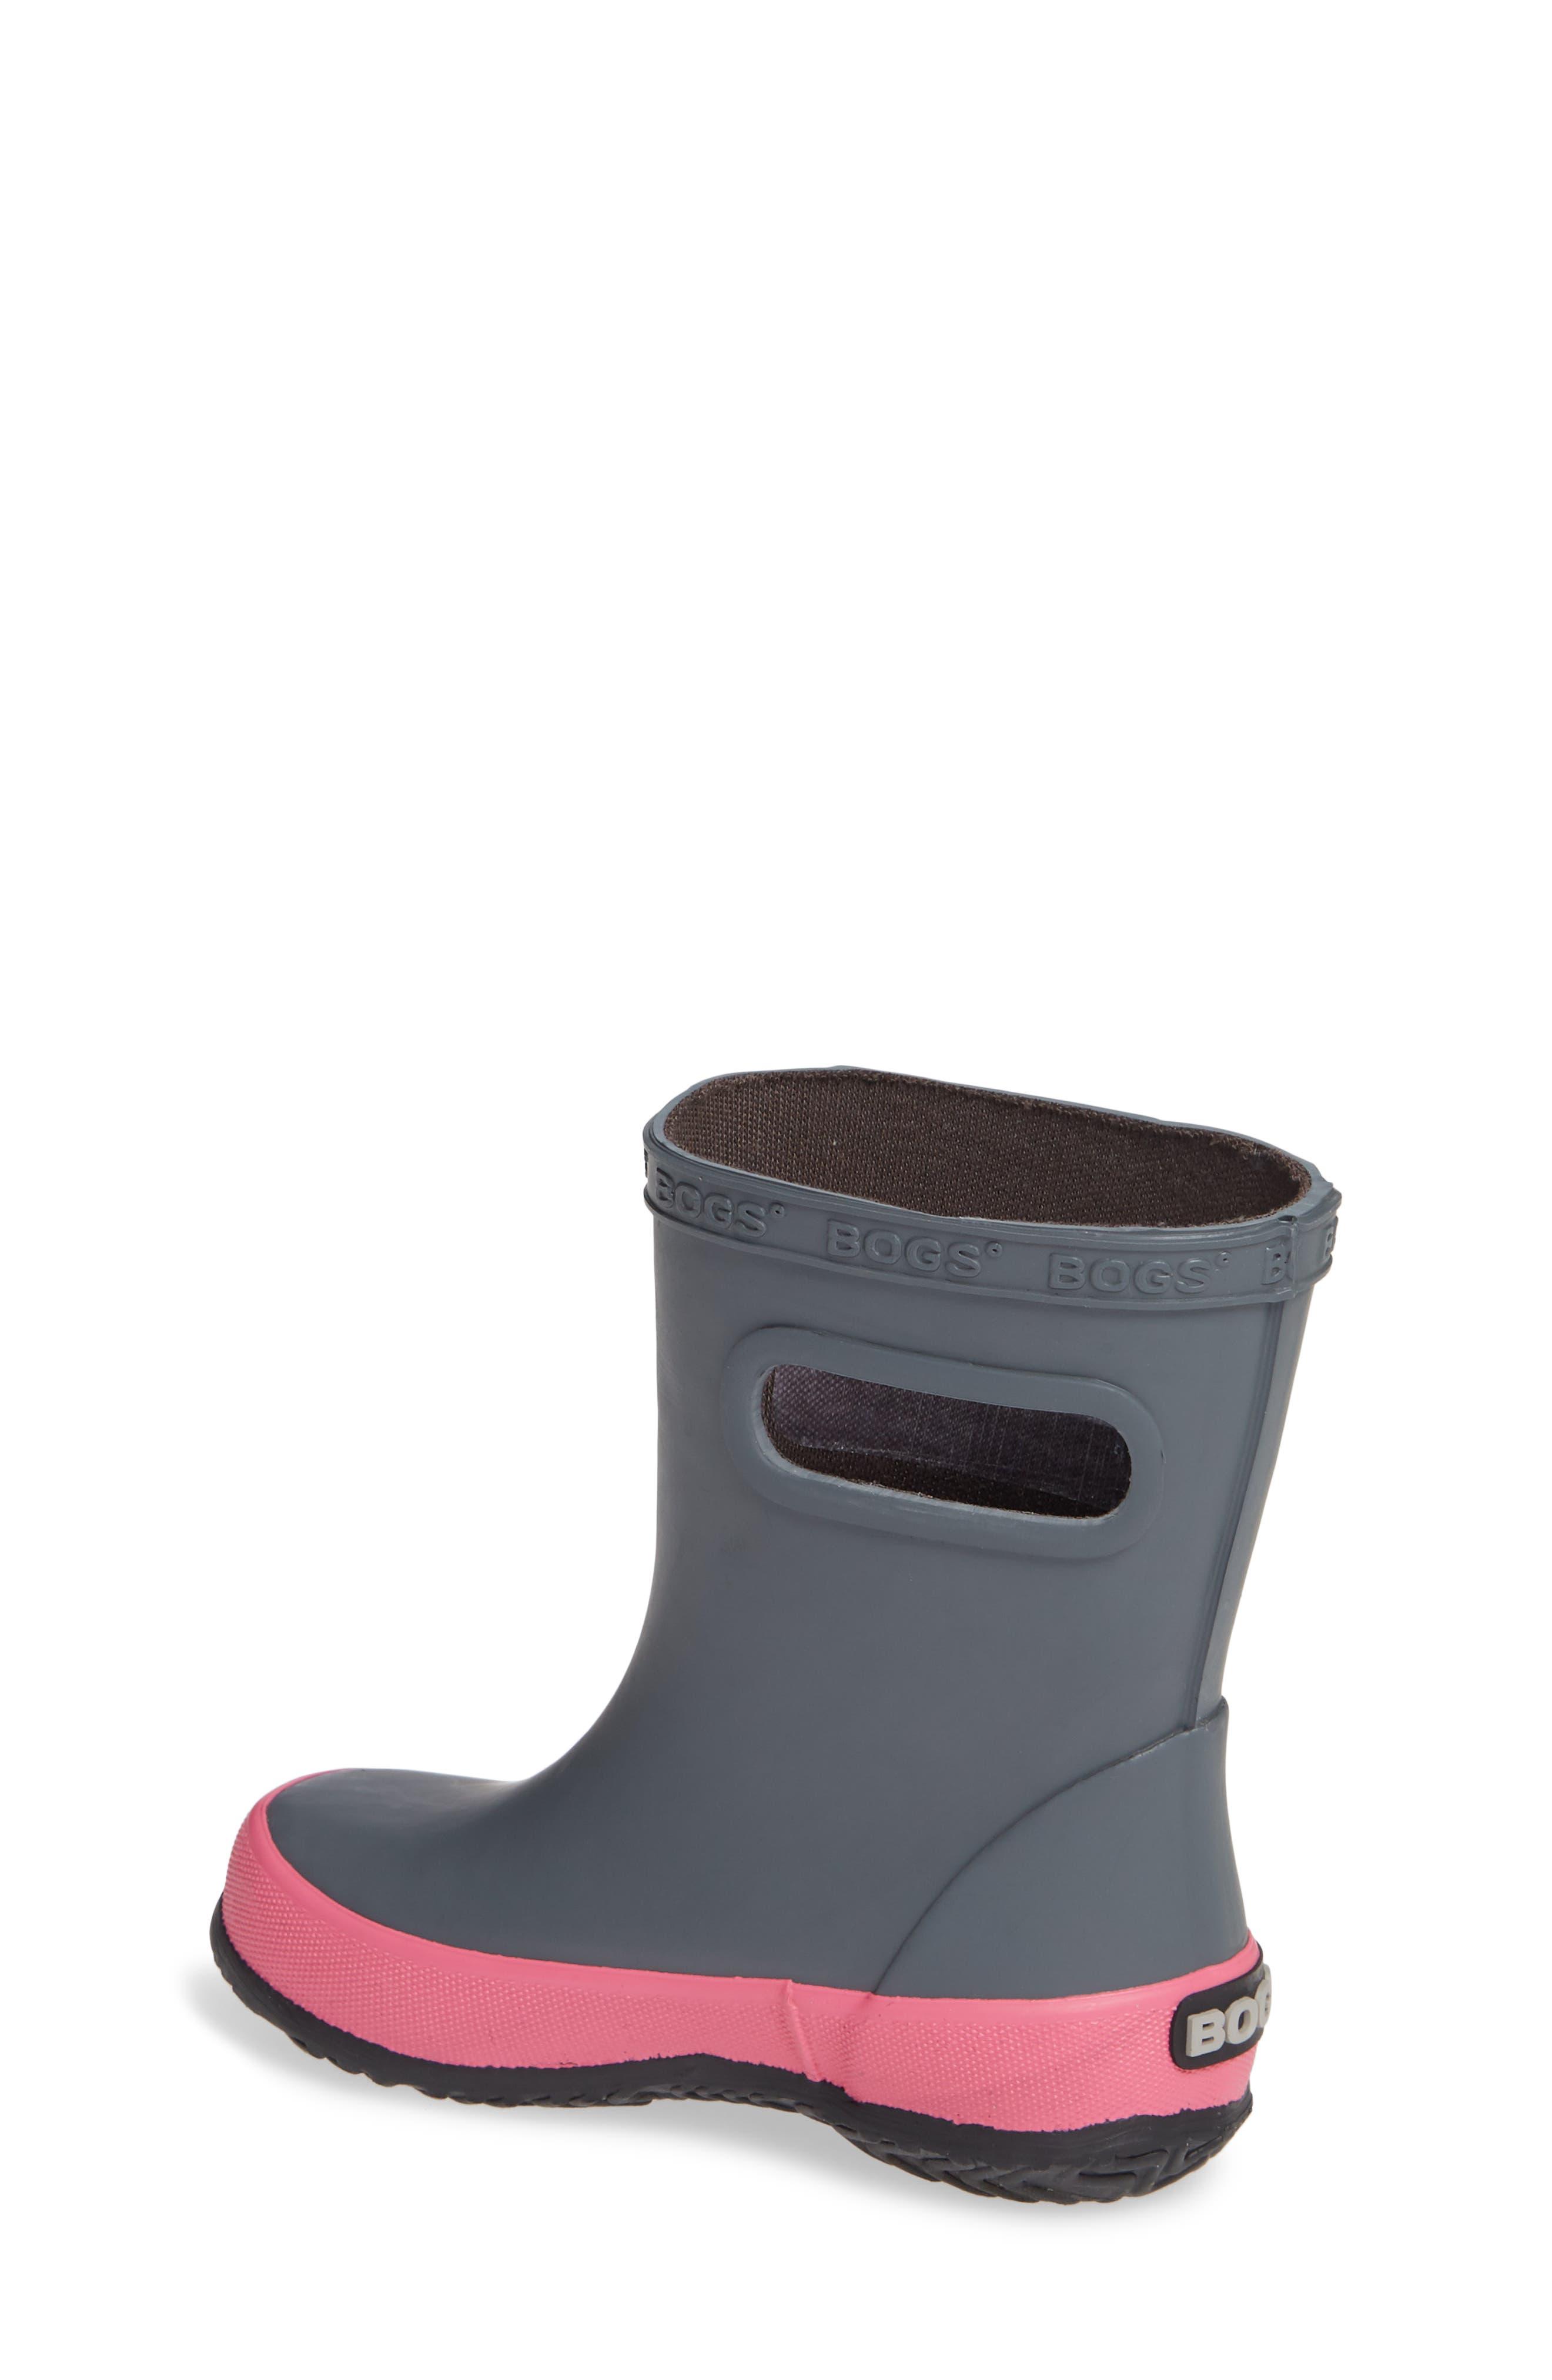 Skipper Solid Rubber Rain Boot,                             Alternate thumbnail 2, color,                             DARK GRAY